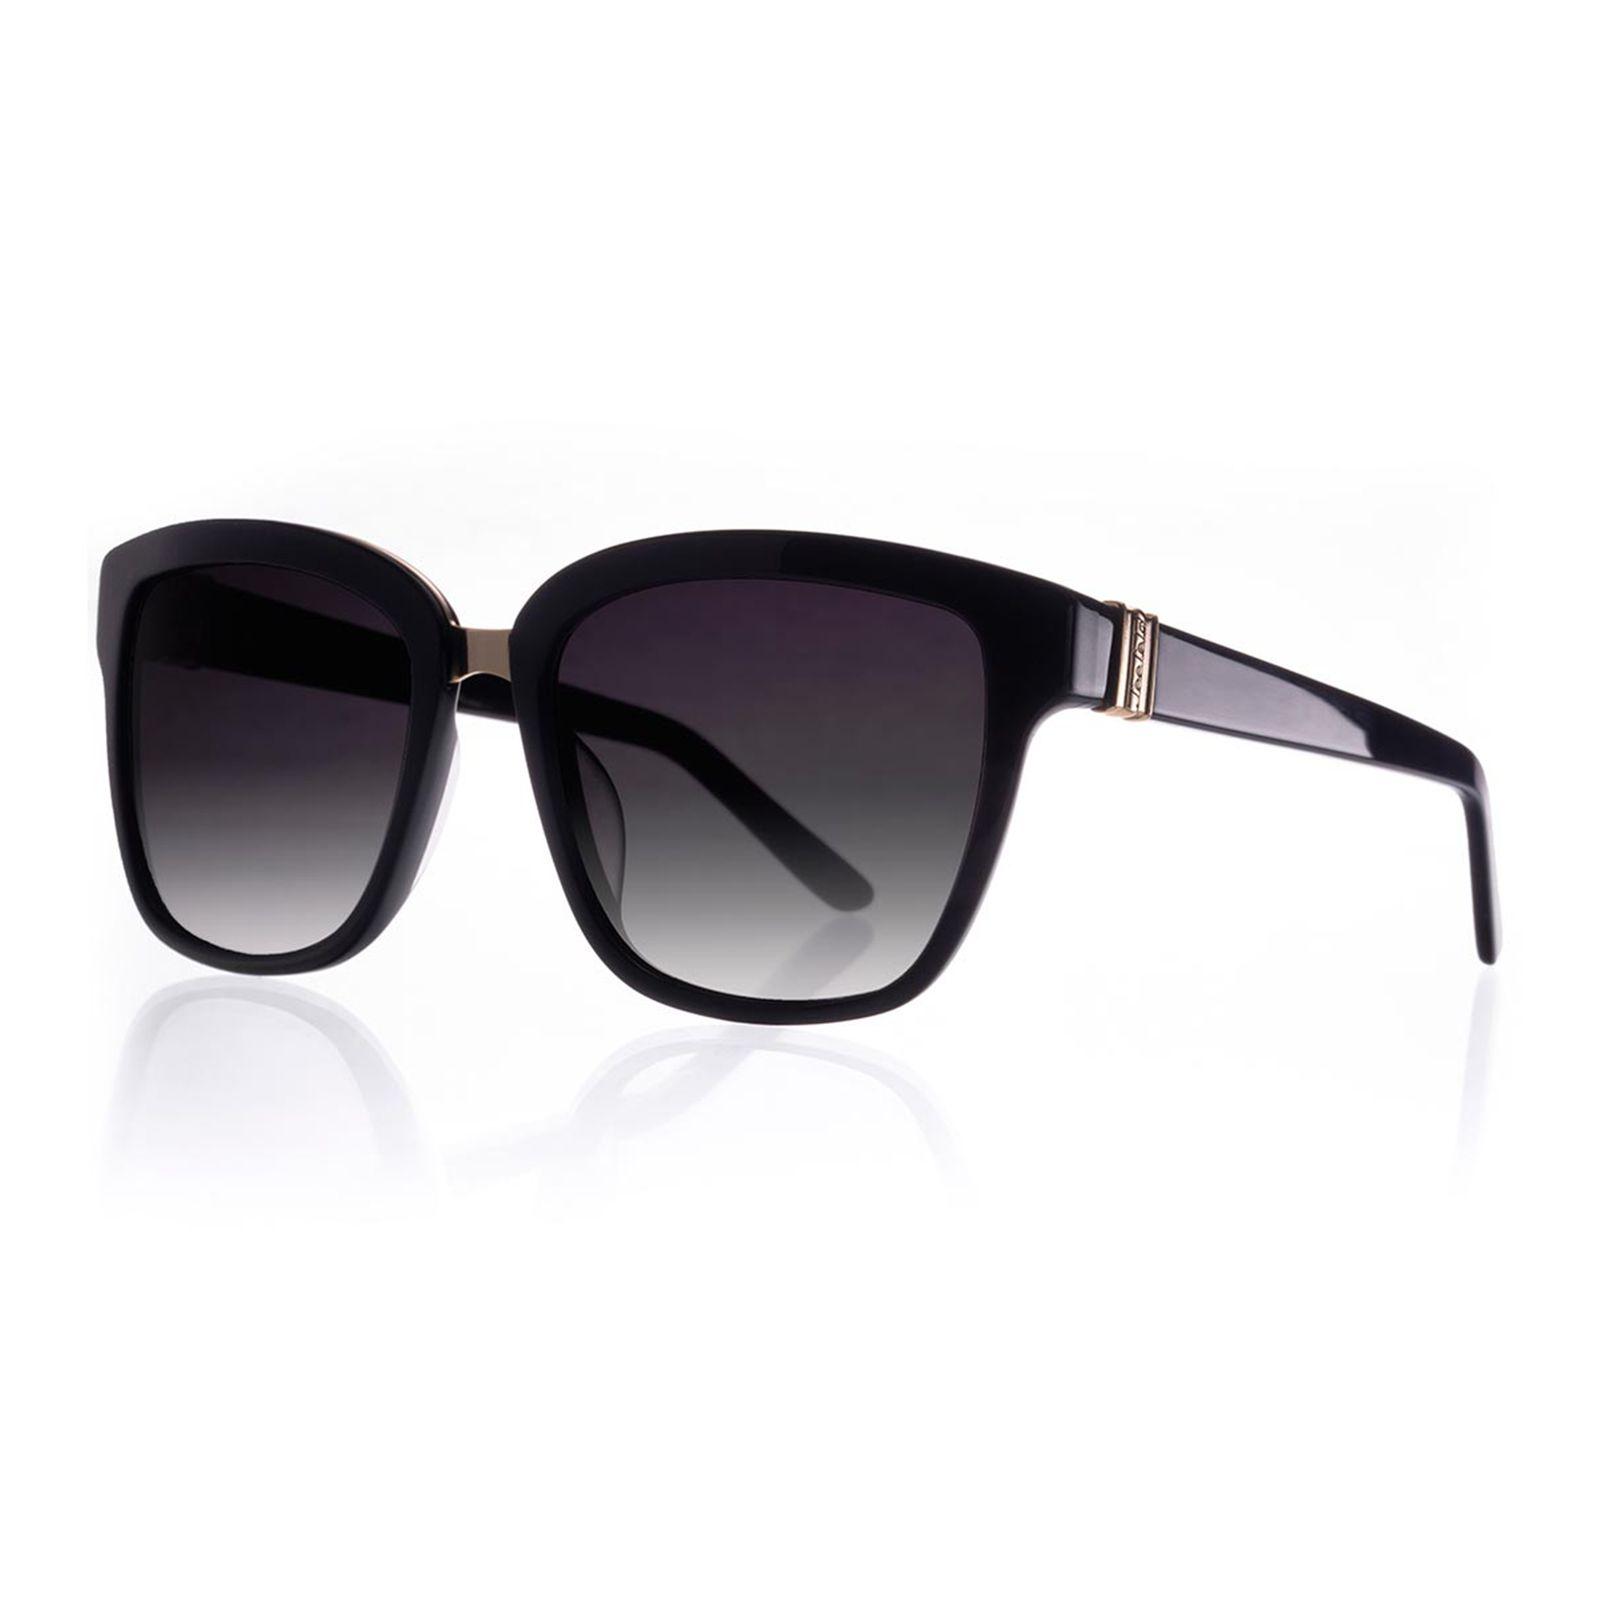 عینک آفتابی زنانه سیفلد مدل هلبرون -  - 2